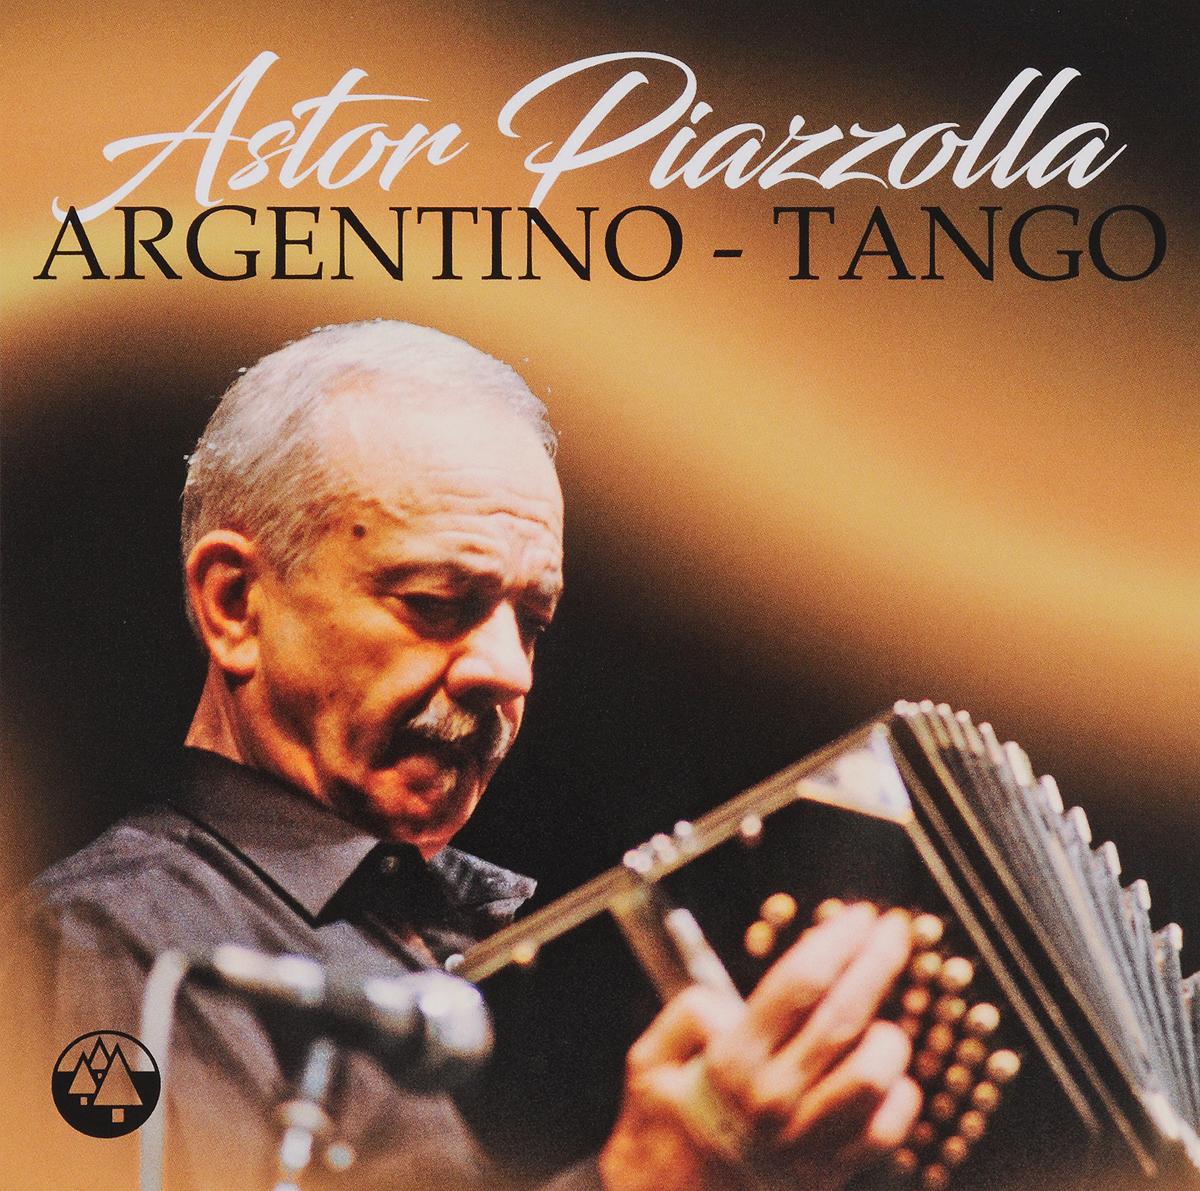 Астор Пьяццолла Astor Piazzolla. Argentino - Tango танго шоу astor tango маркос аяла и его труппа аргентина